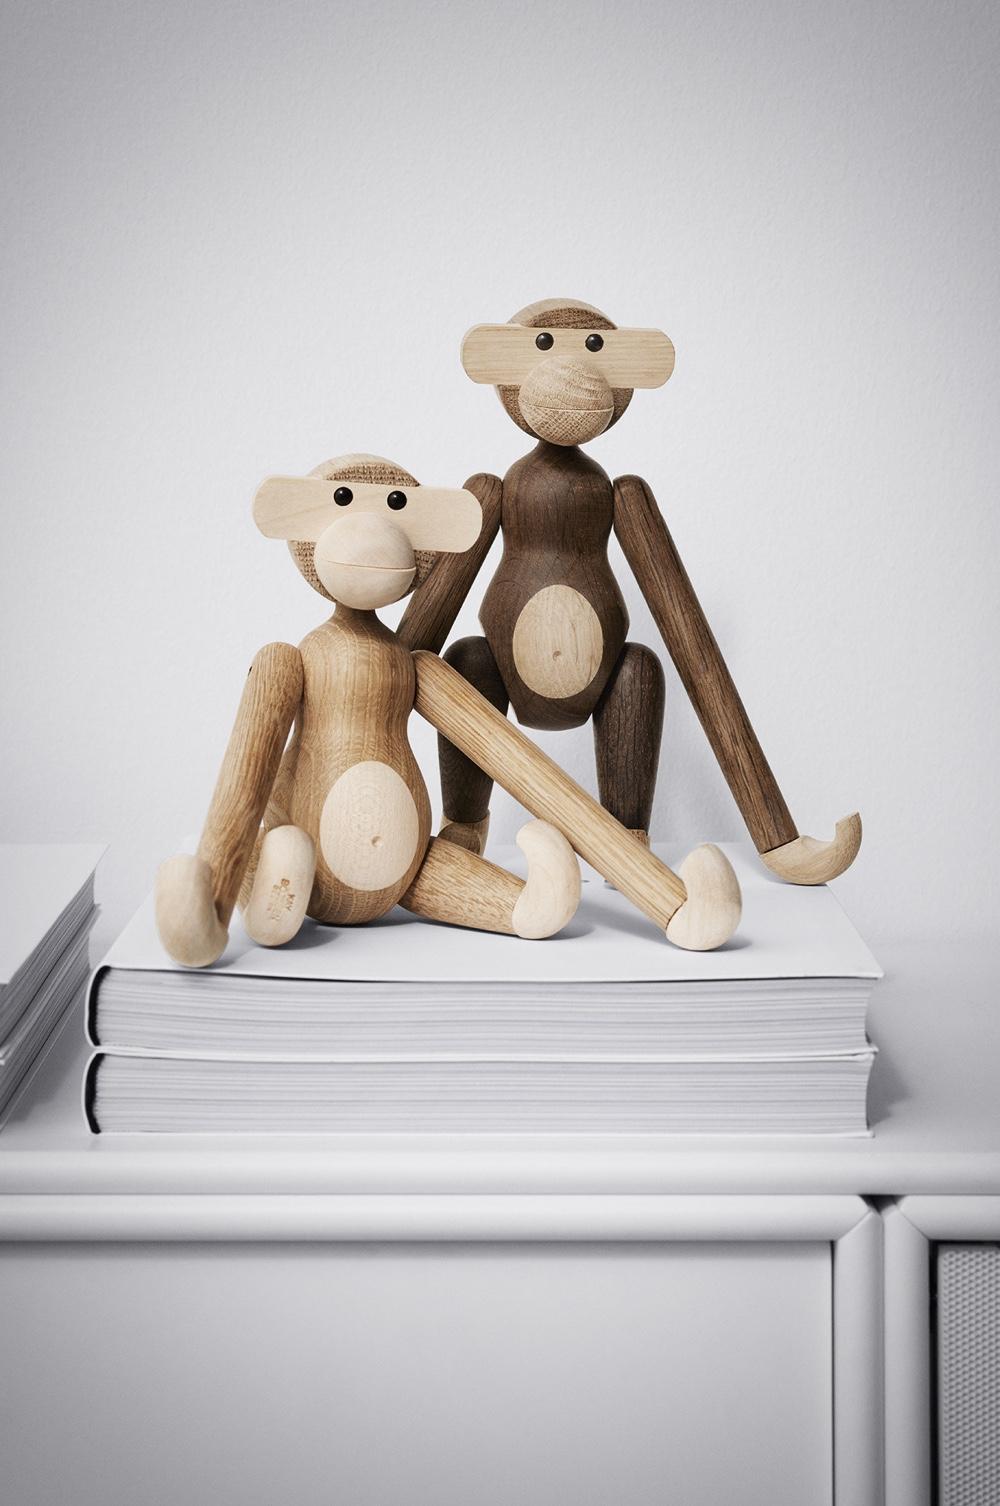 Monkey new woods More Monkey Business: Kay Bojesen Denmark Revisits the Classic Wooden Monkey